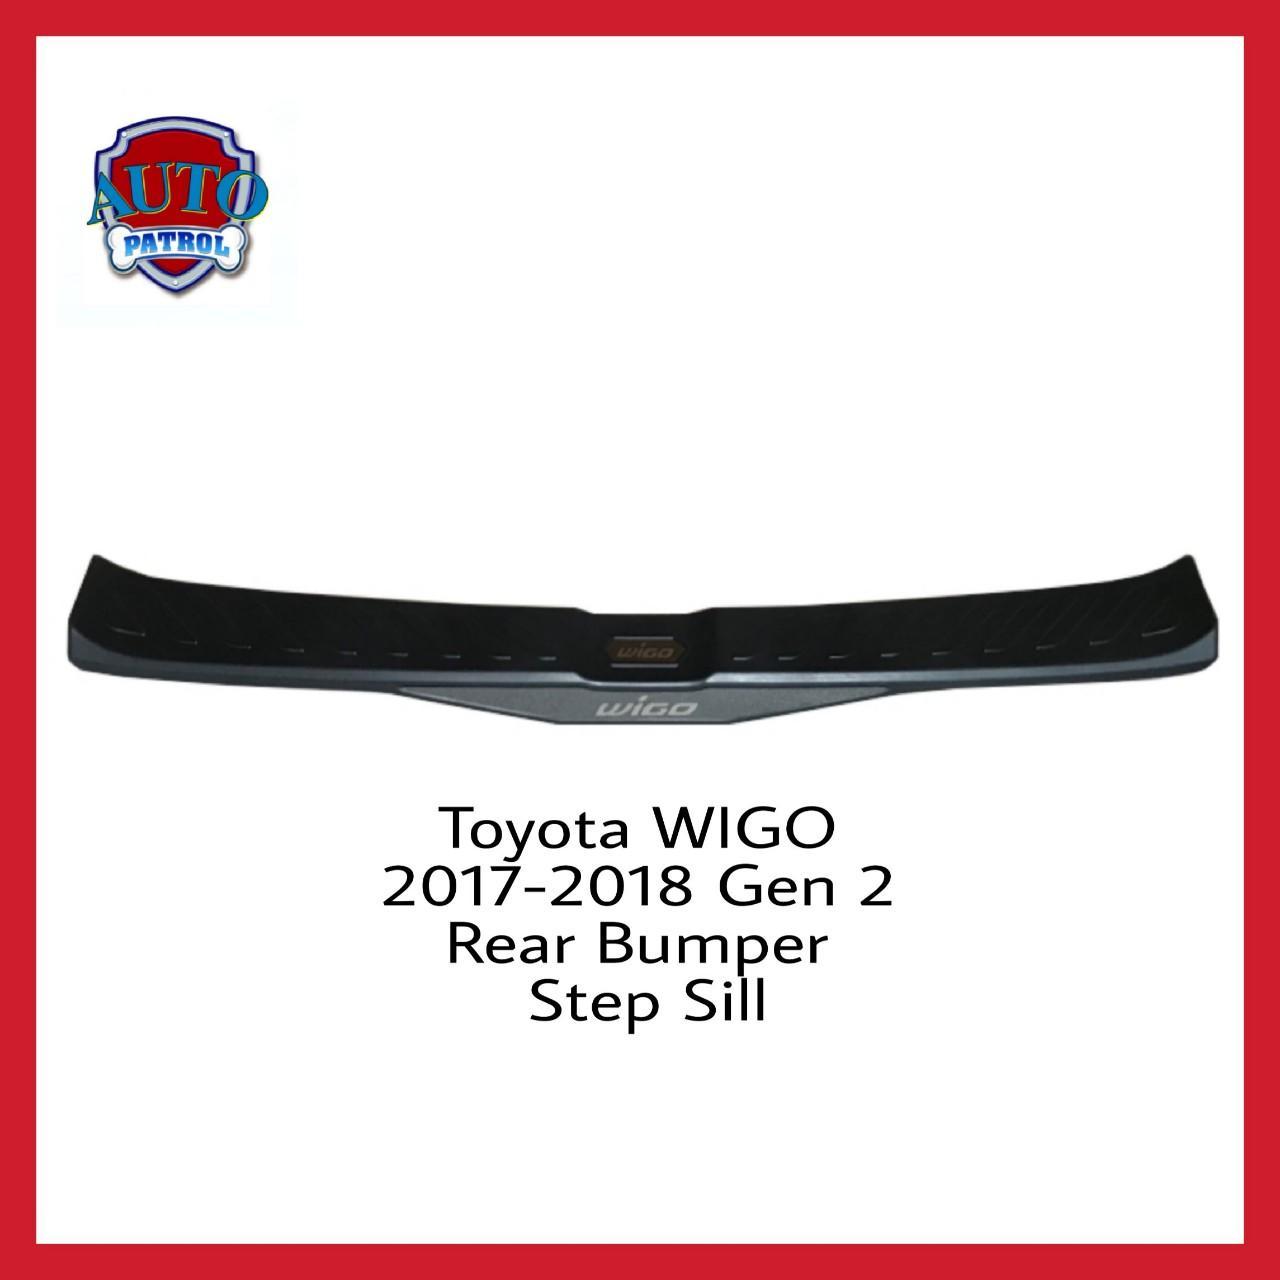 Toyota Wigo 2017-2019 Gen 2 Rear Bumper Step Sill (black And Chrome) By Auto Patrol.